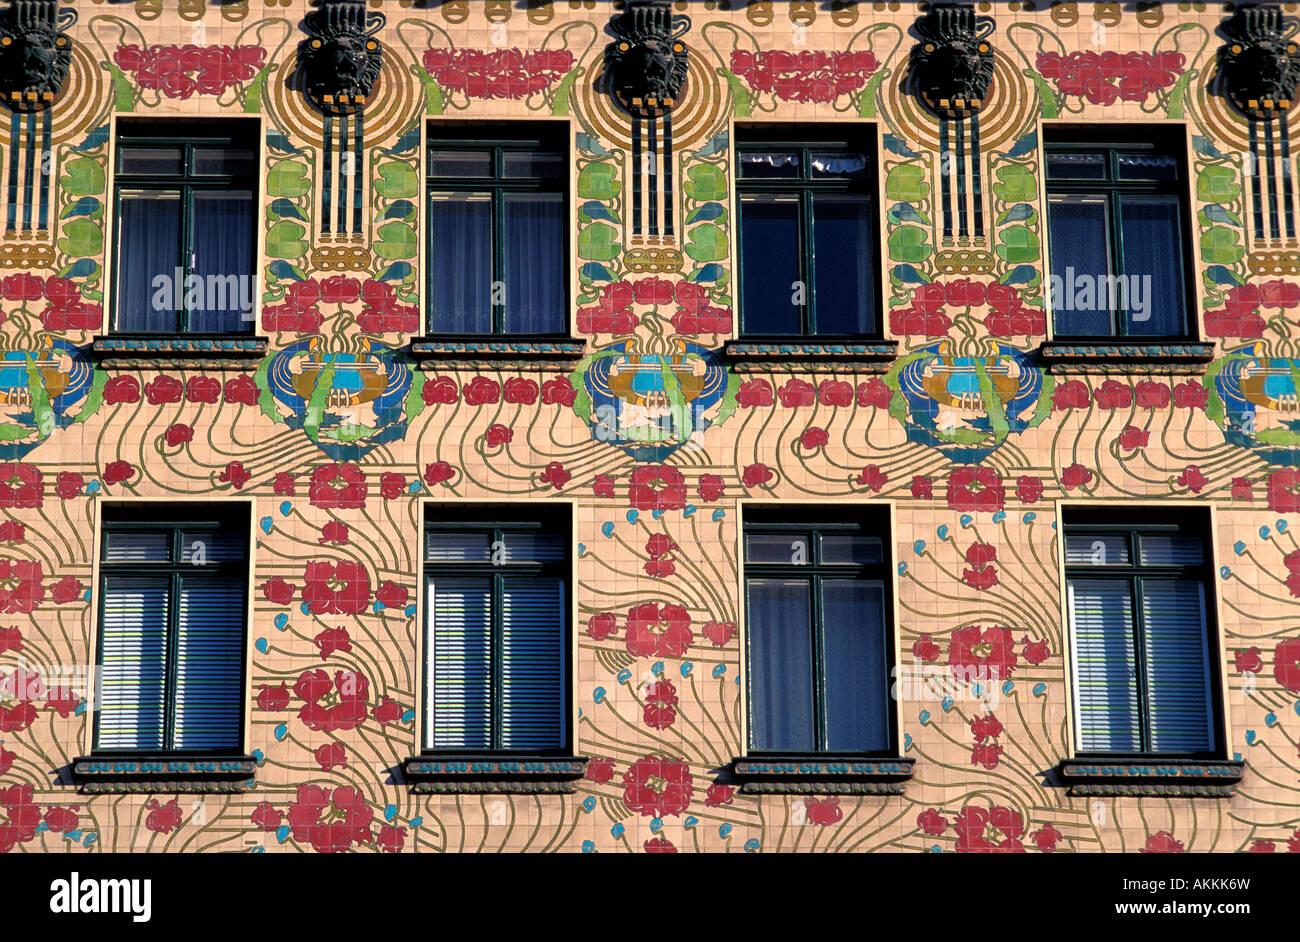 Art and Architecture Vienna